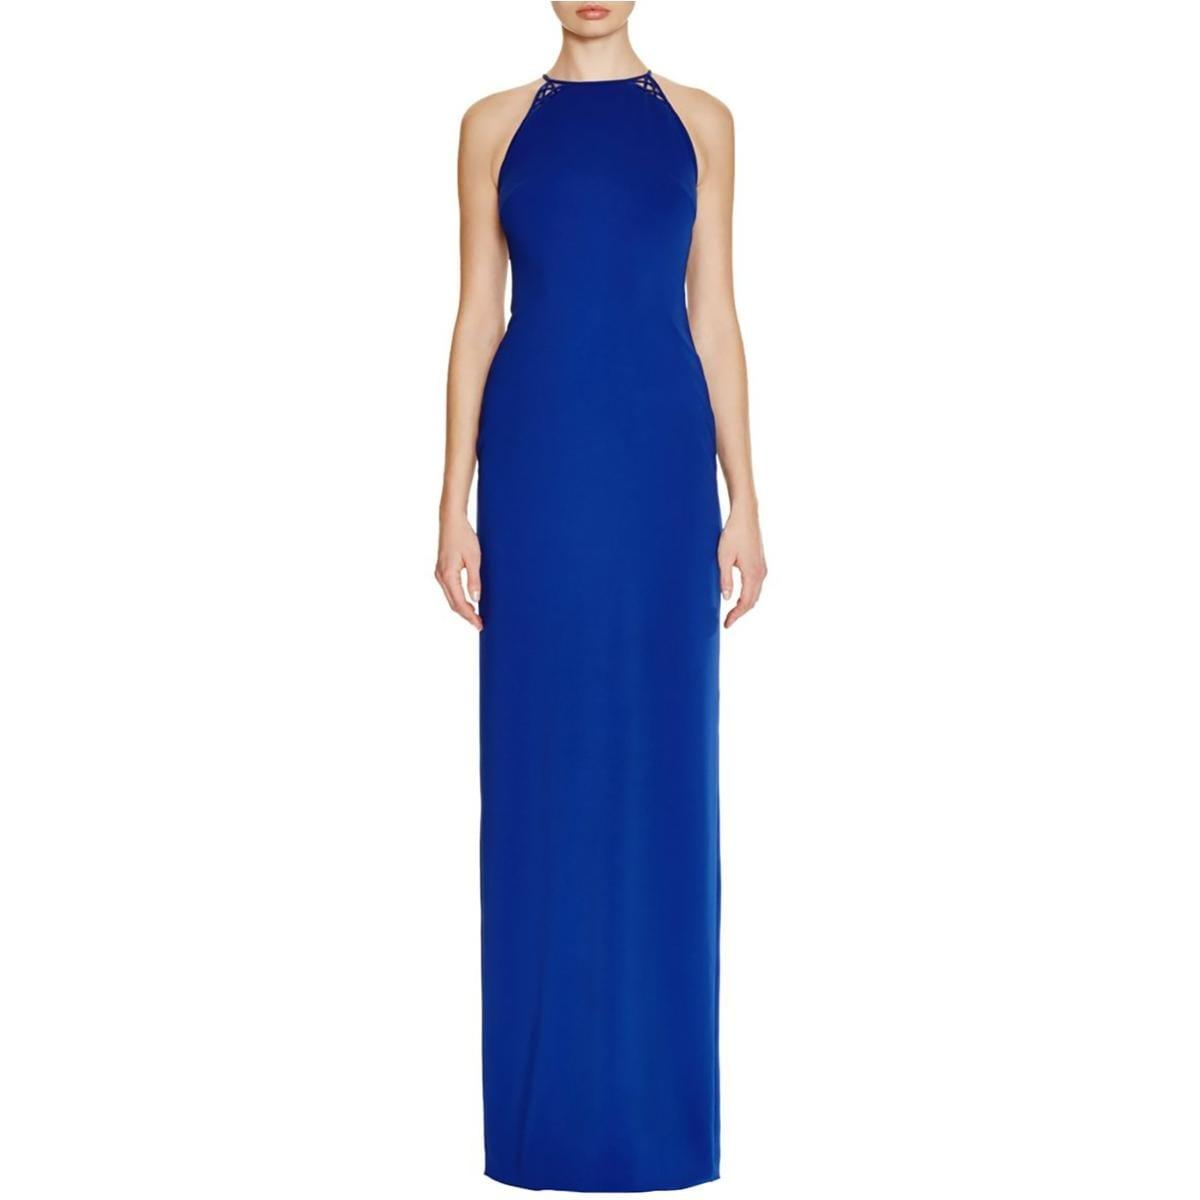 92ae7b10e8 Shop Badgley Mischka Womens Evening Dress Lattice Back High Neck - Free  Shipping Today - Overstock - 15889694